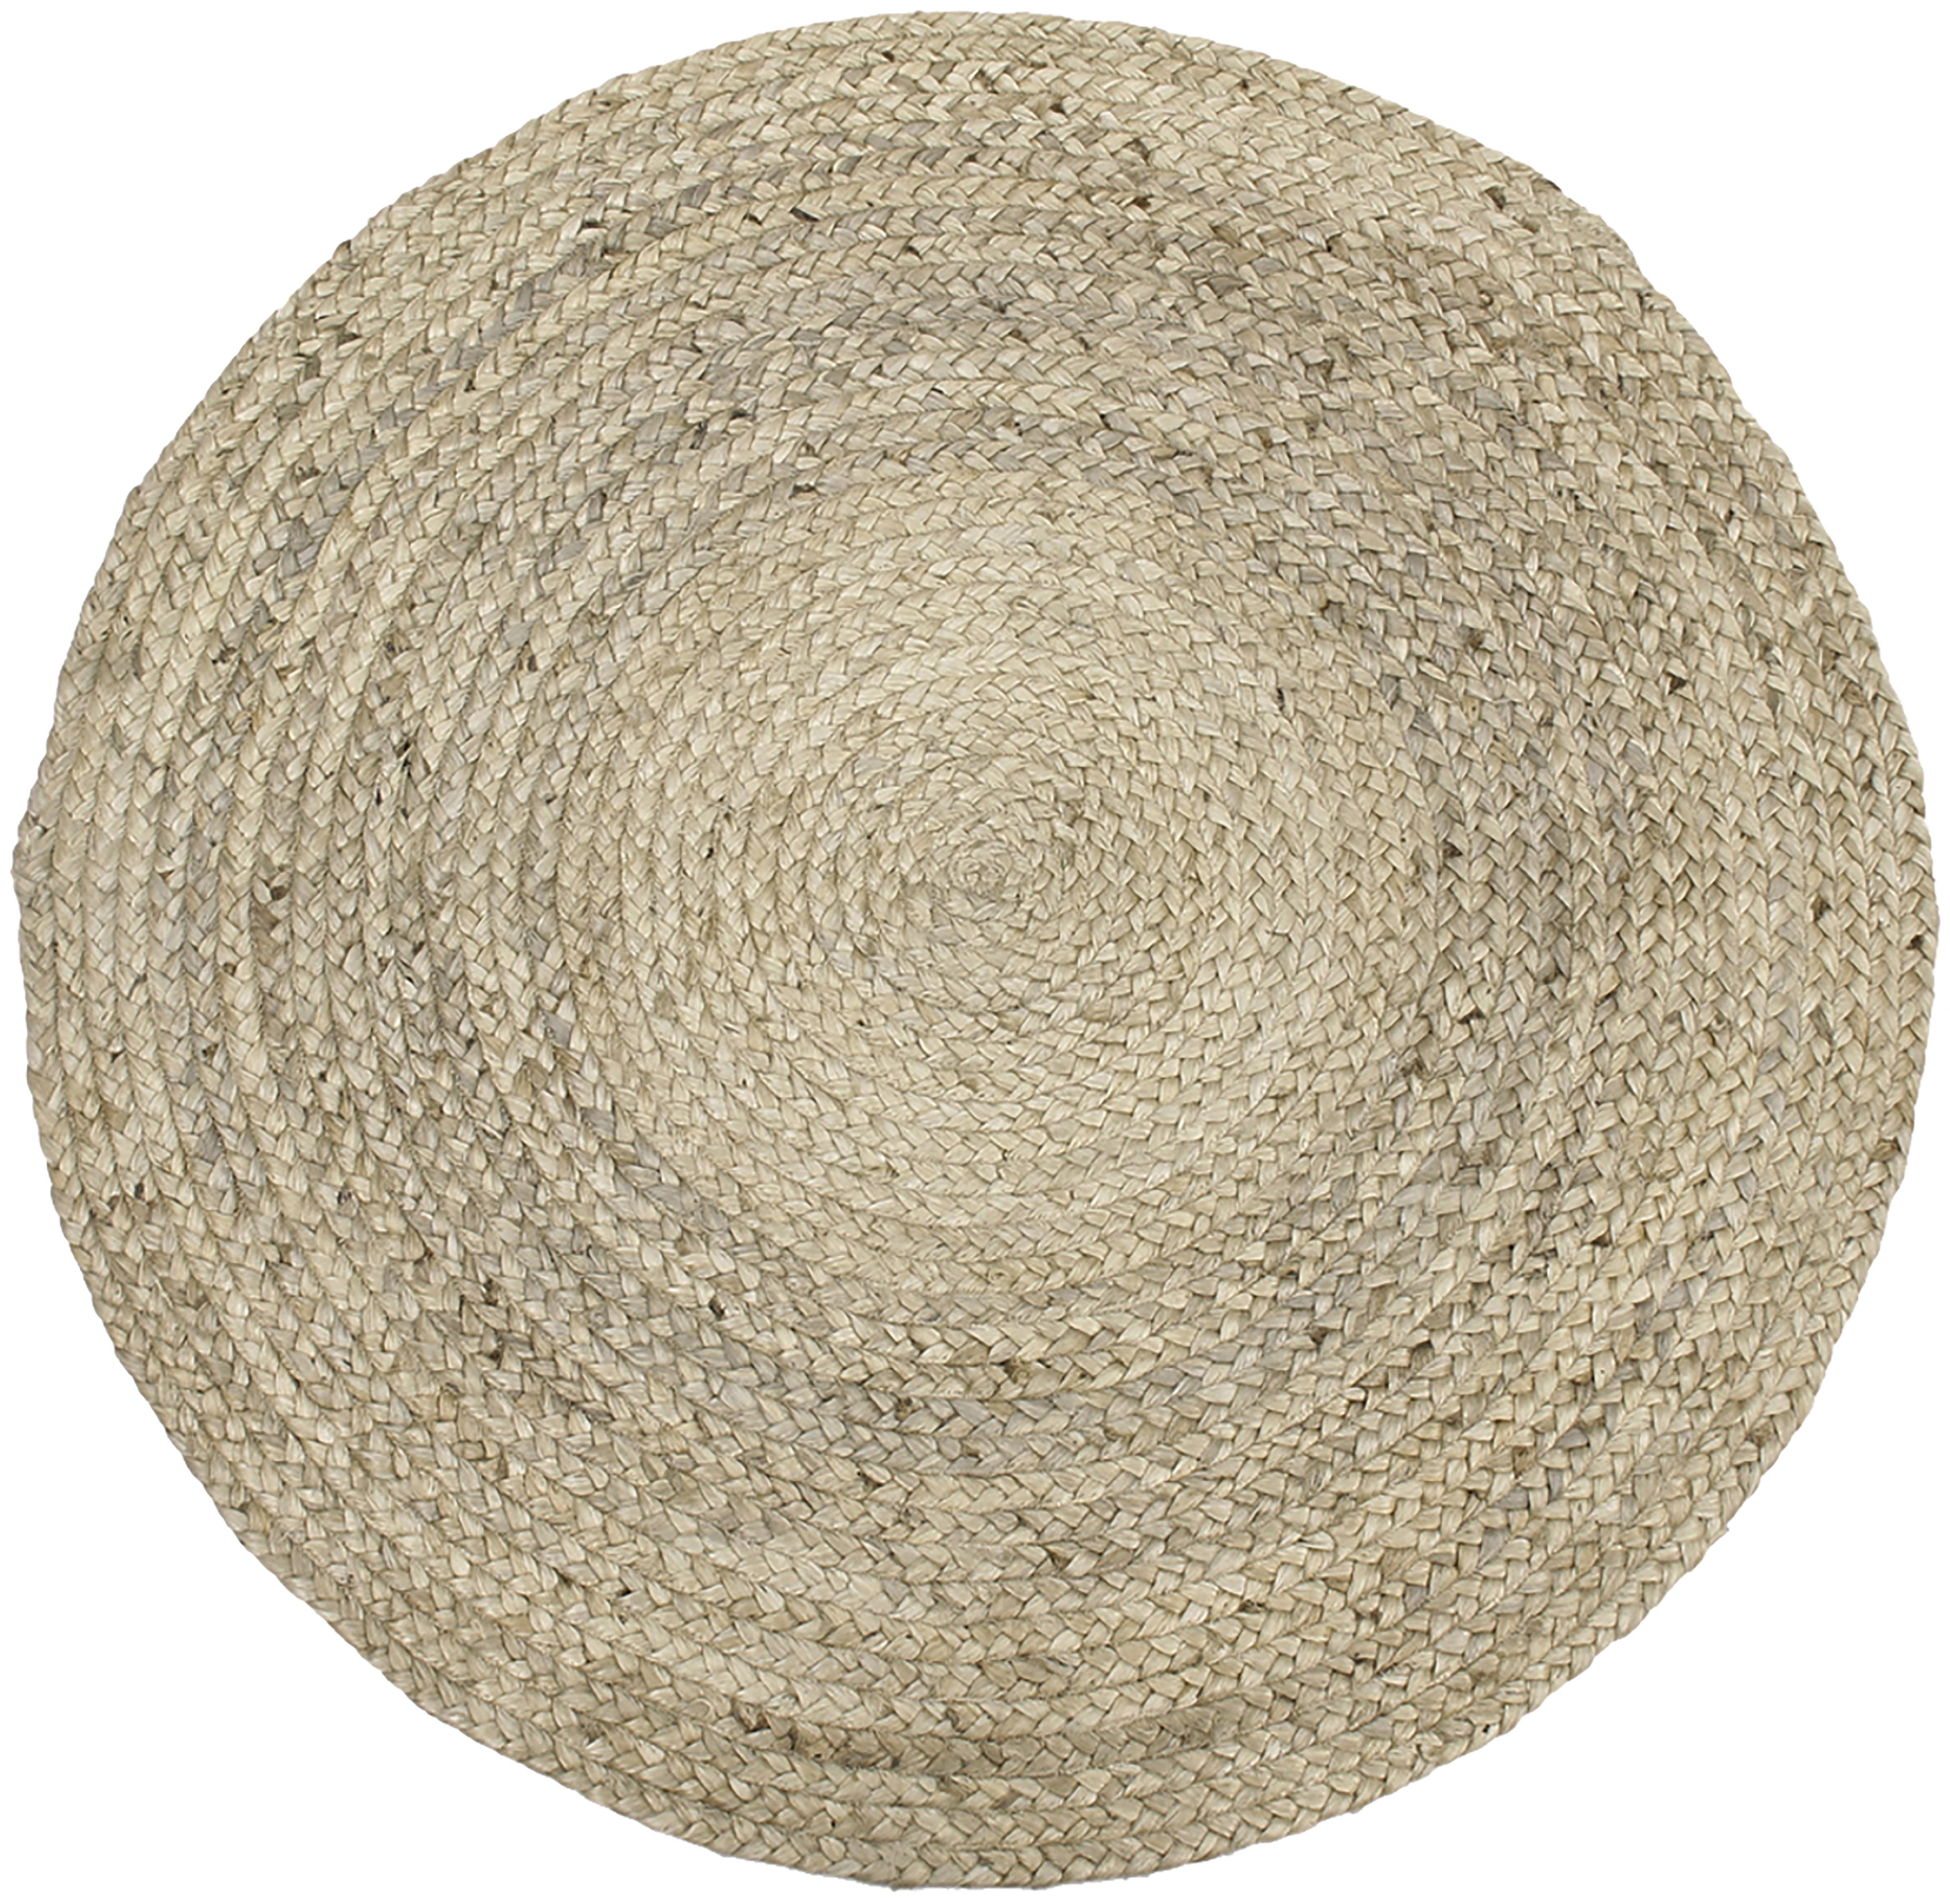 Tappeto in juta tessuto a mano Sharmila, Beige, Ø 100 cm (taglia XS)